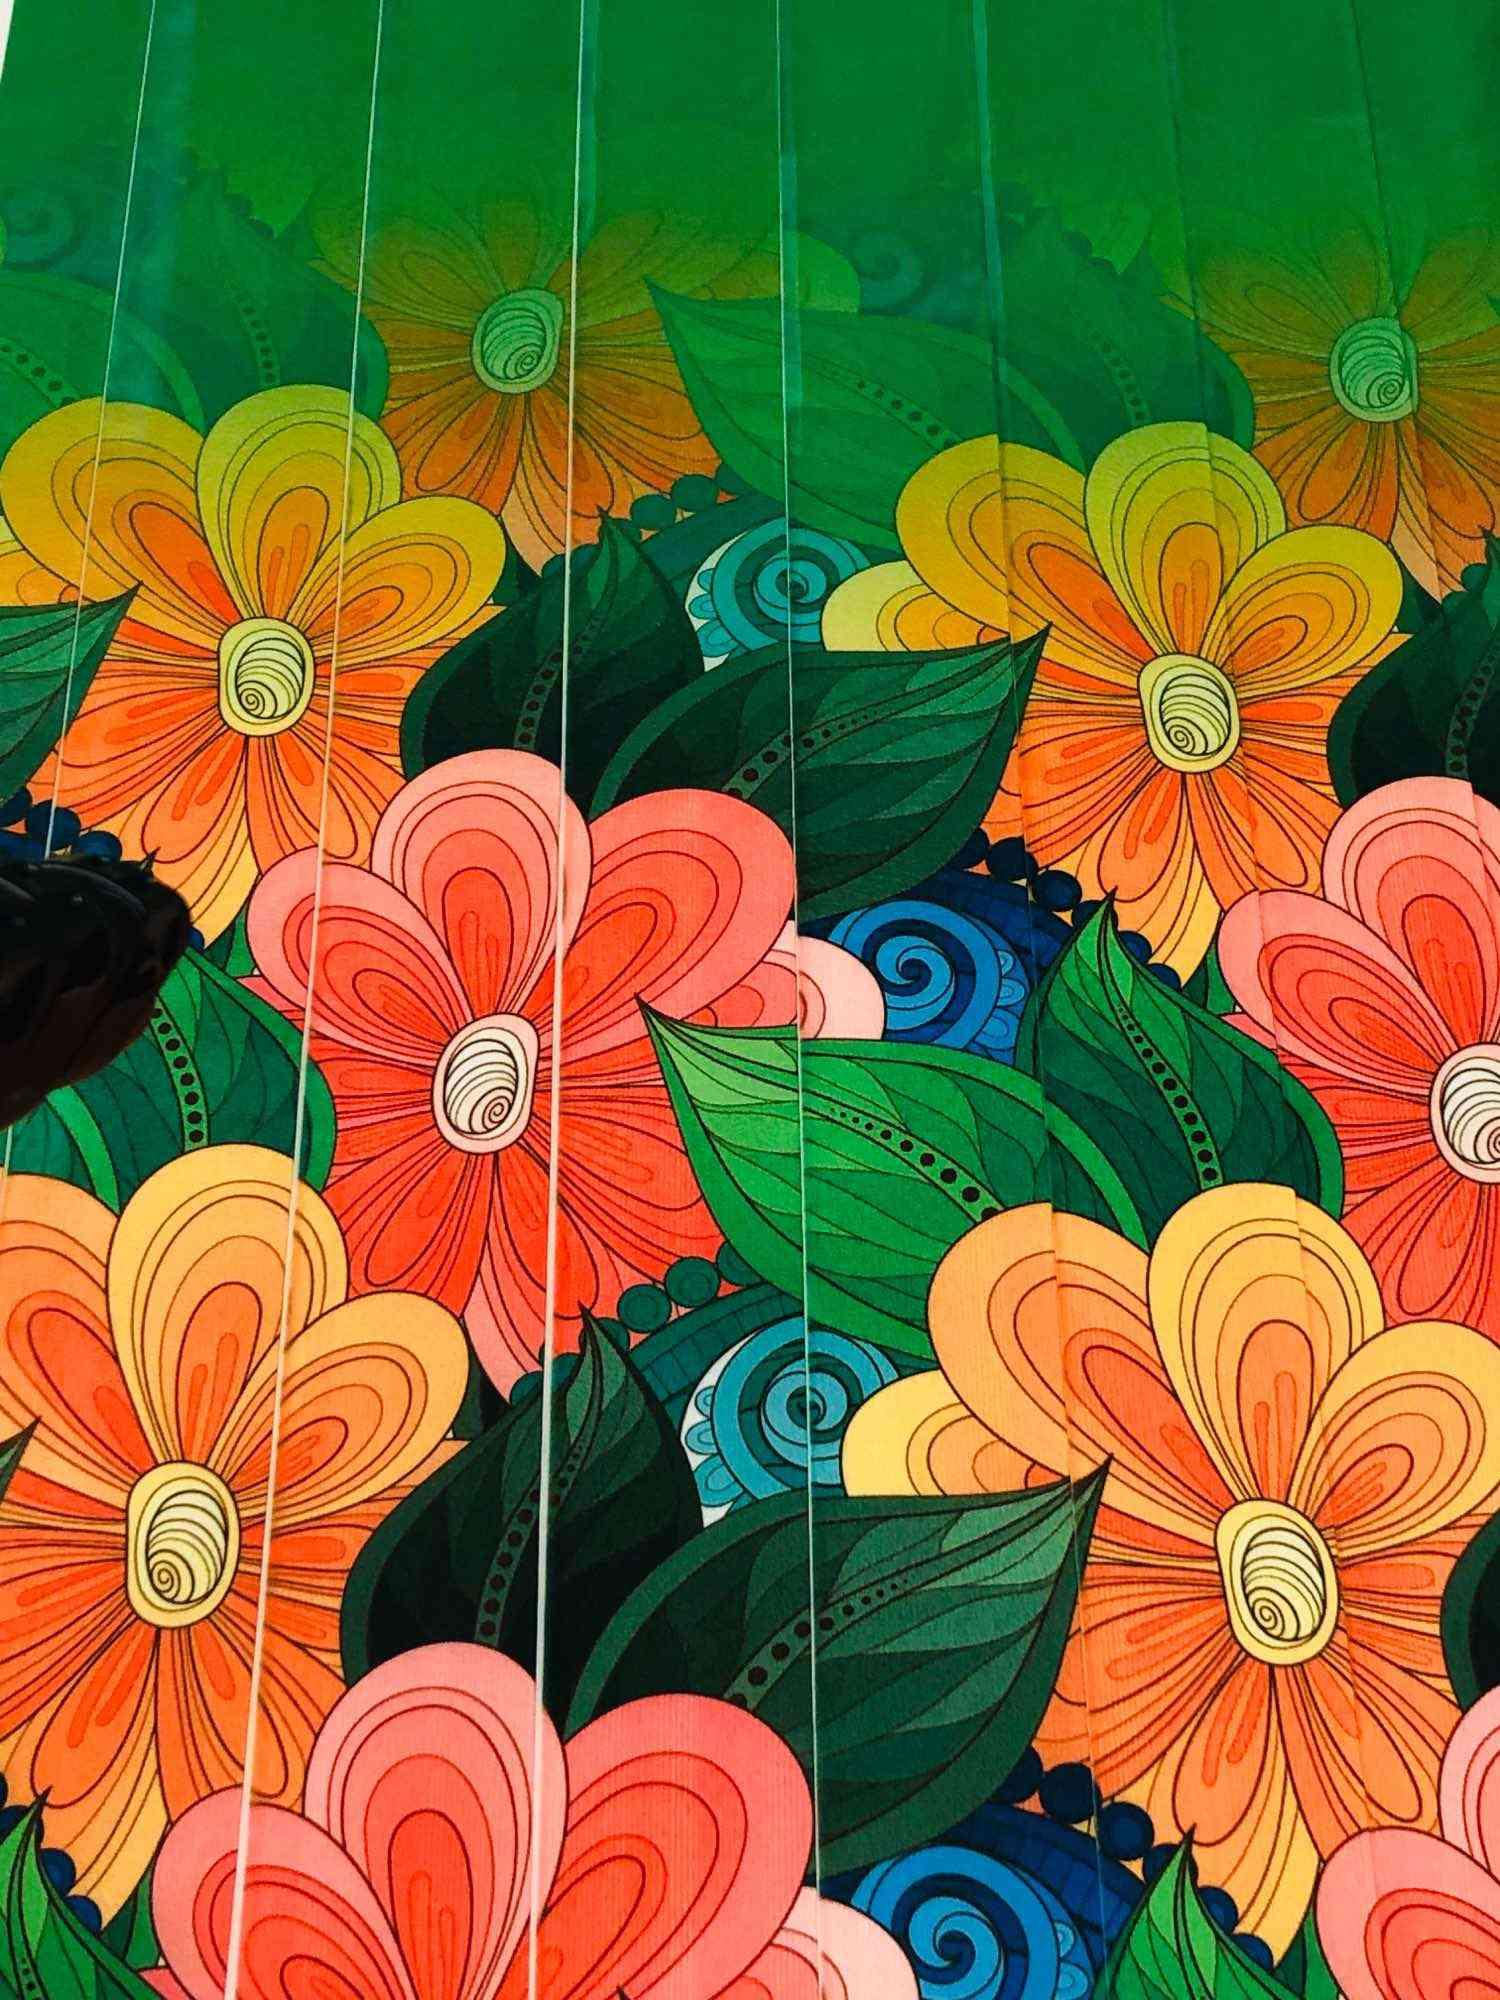 Printed Fabrics - plico 7176 - PLICO 7176 Polyester